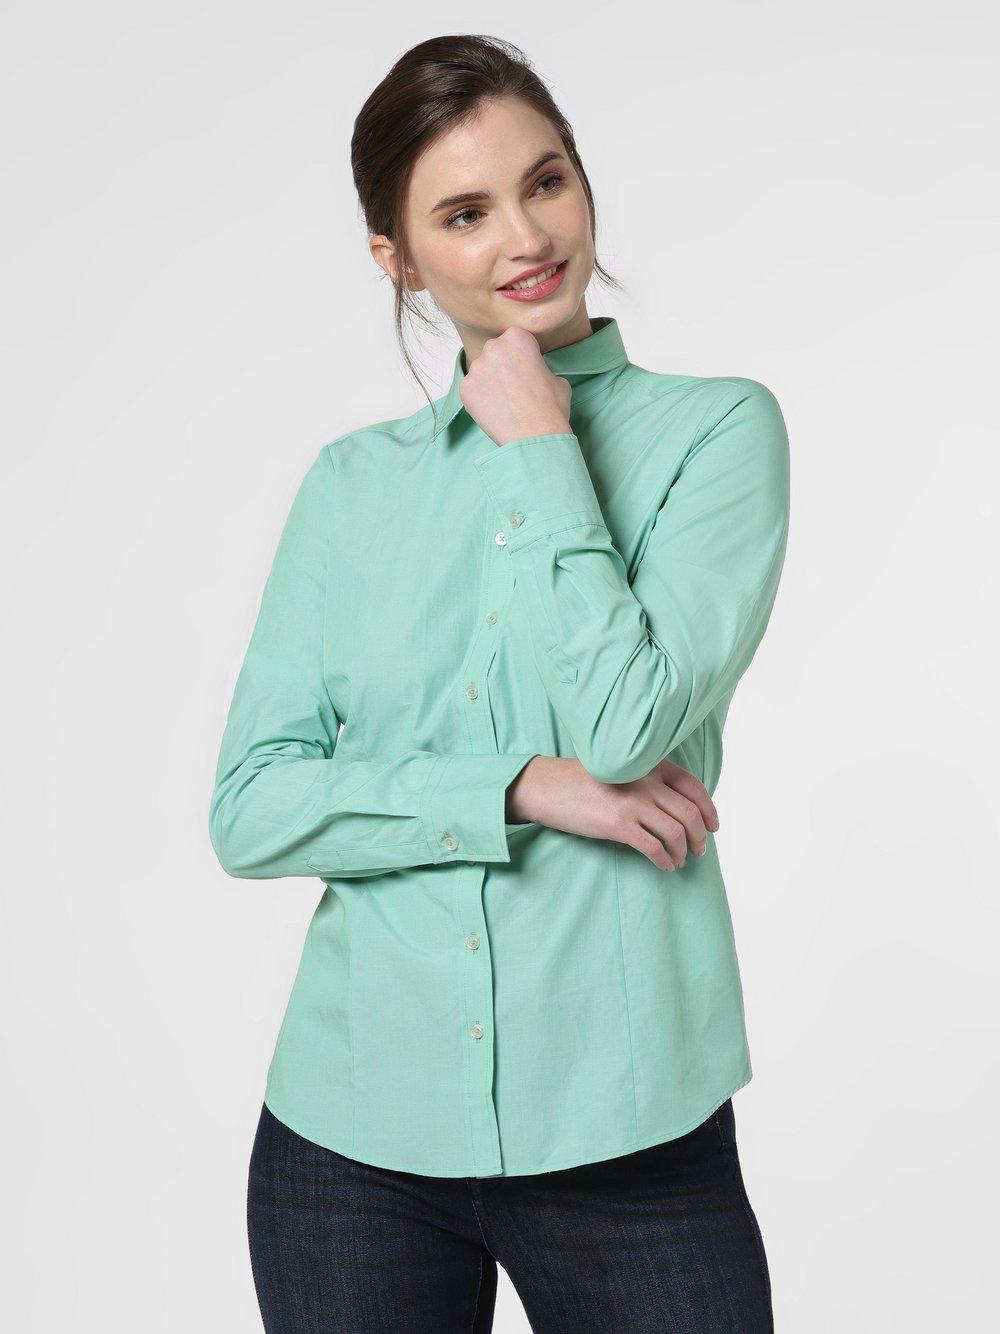 brookshire - Bluzka damska, zielony